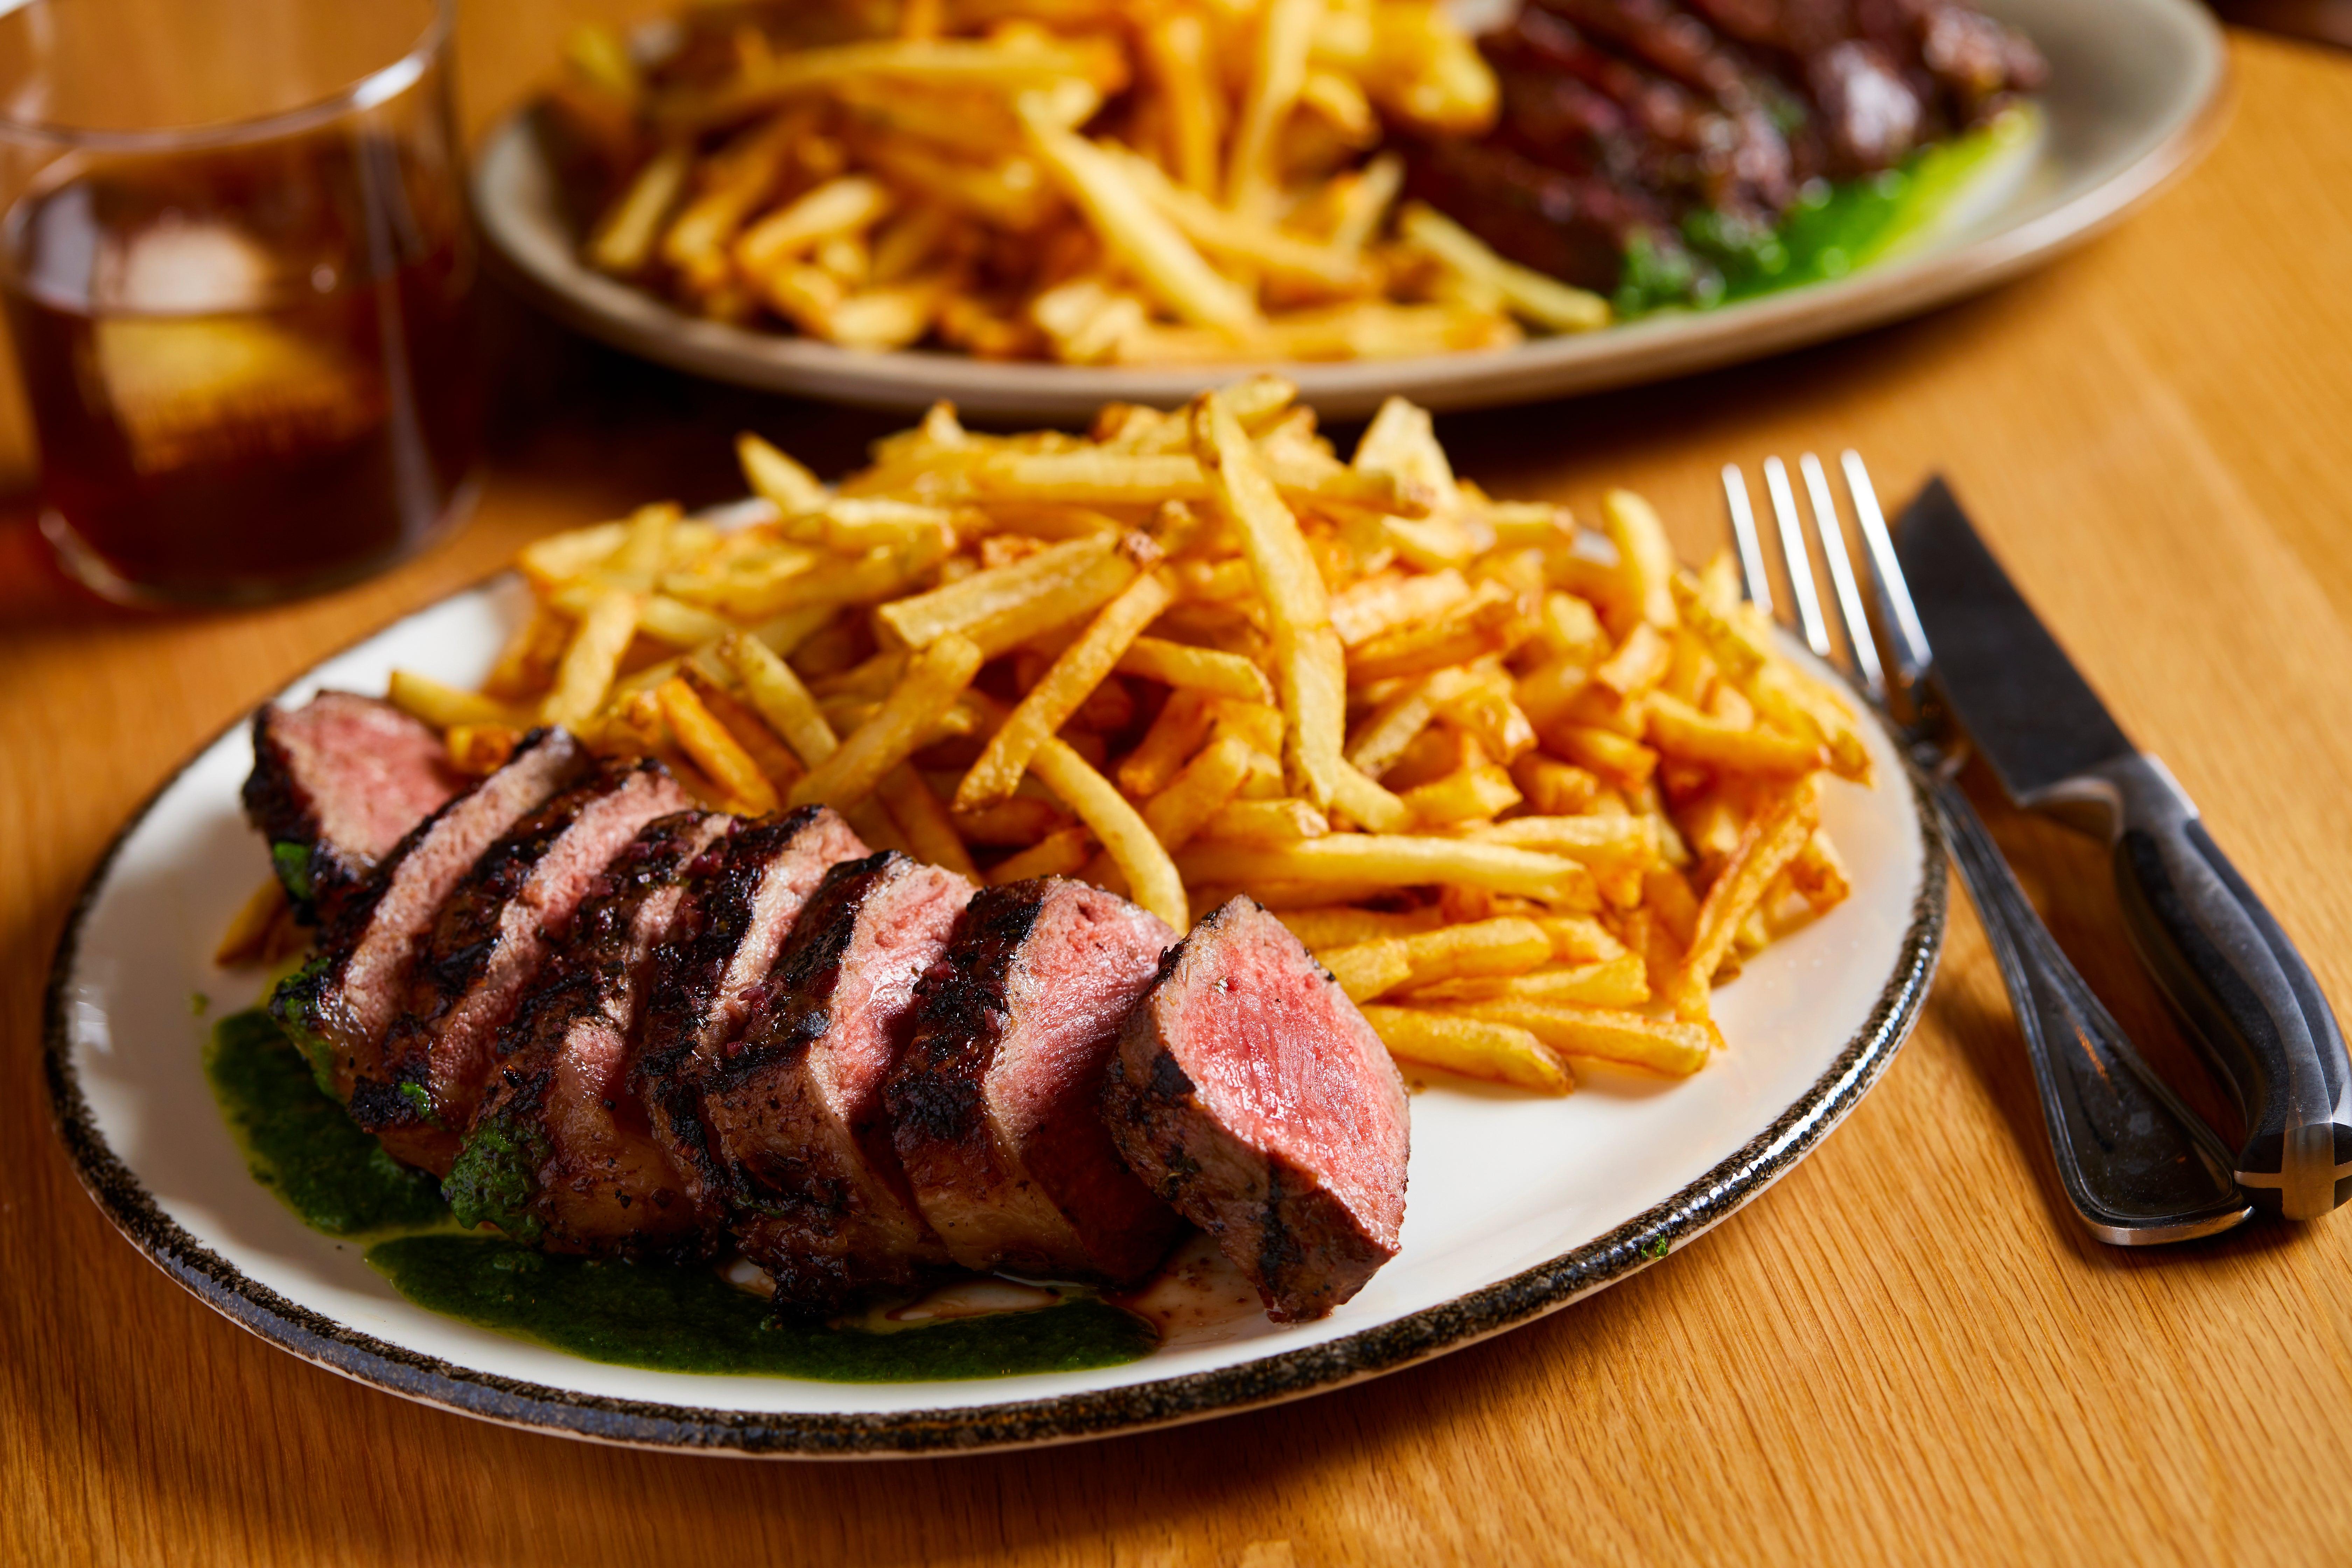 Steak frites at LUCIE drink + dine